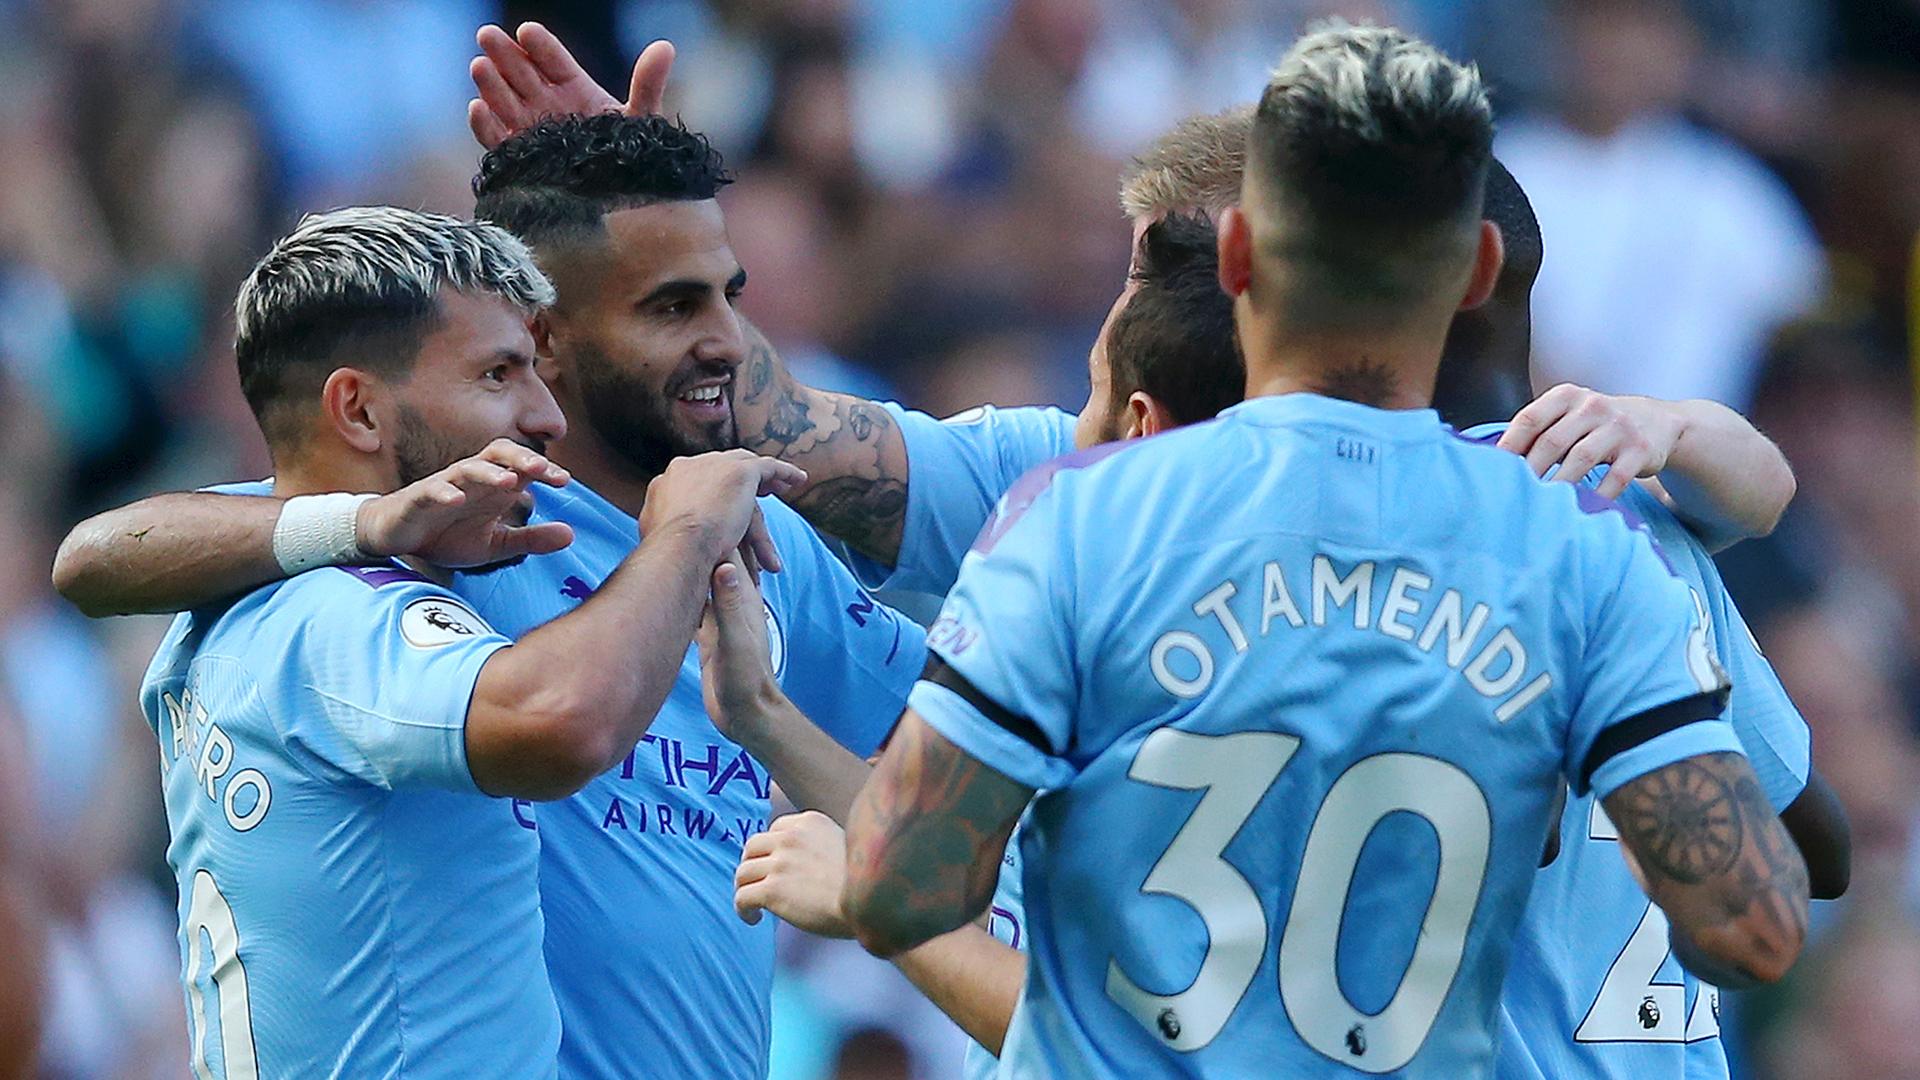 Mahrez scores first Premier League goal of the season as Manchester City demolish Watford